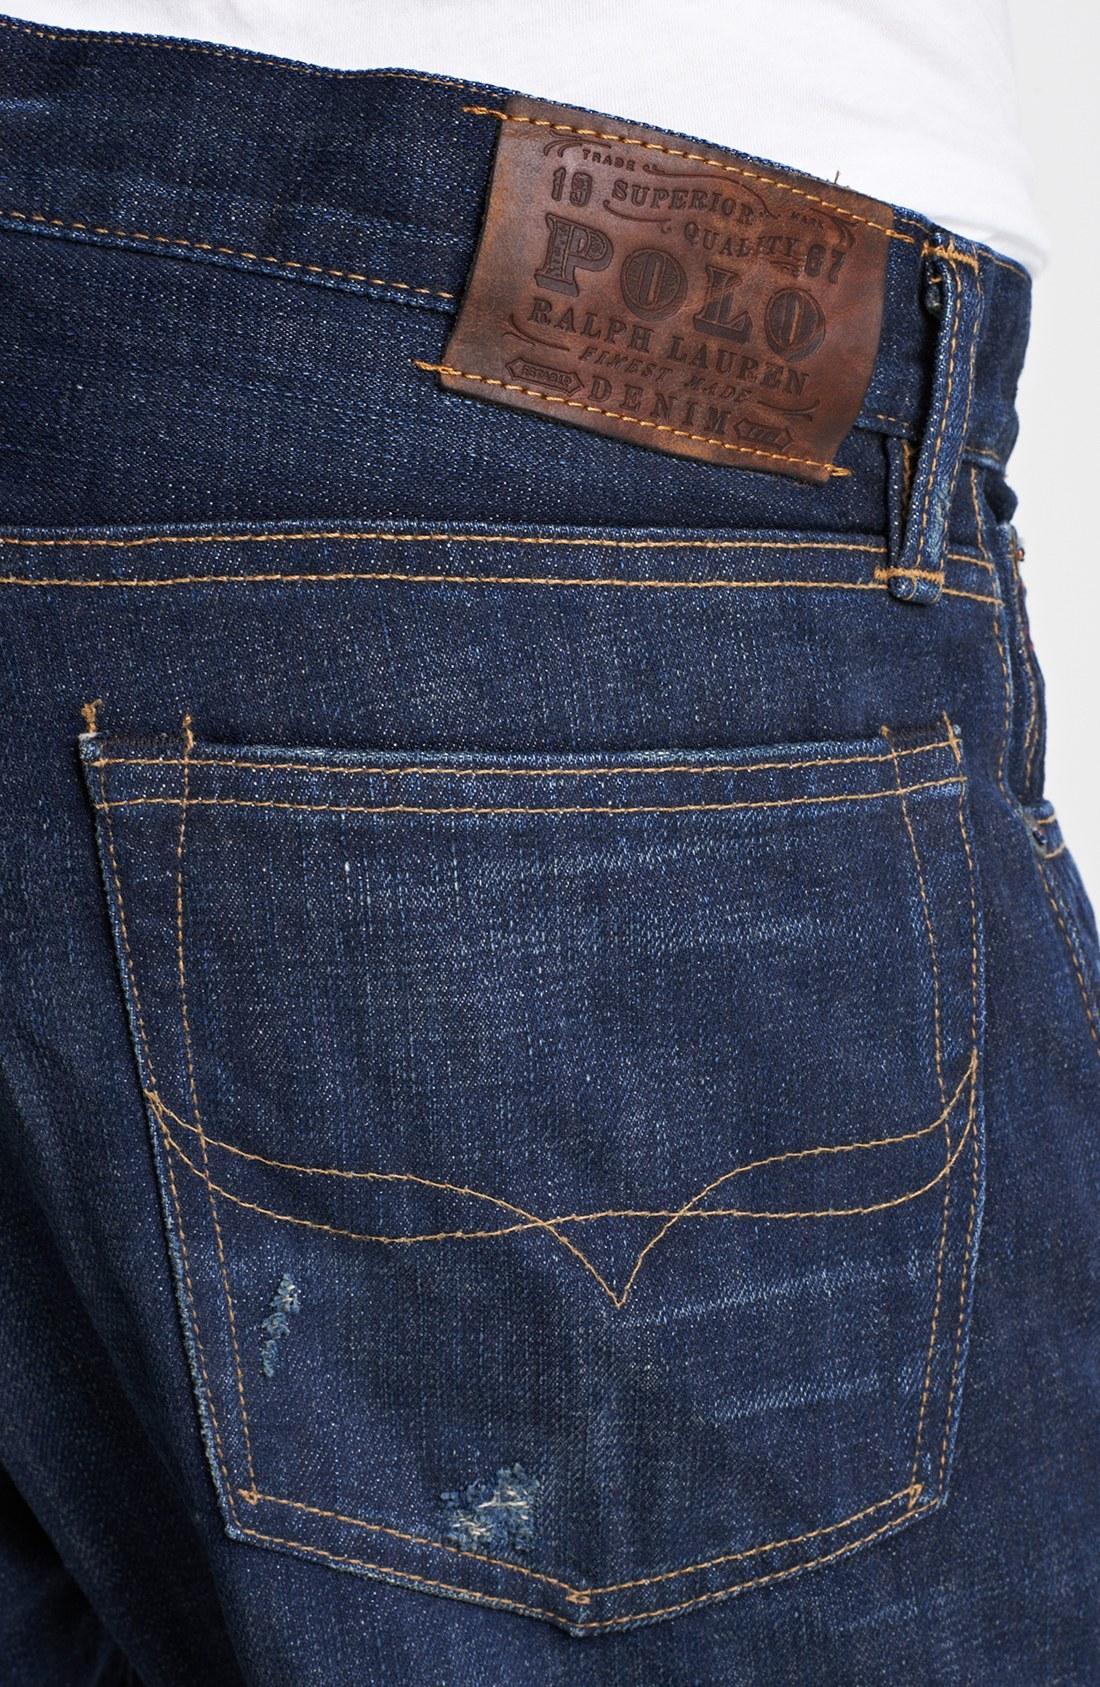 aada0a130 Polo ralph lauren Roebling Slim Fit Selvedge Jeans in Blue for Men